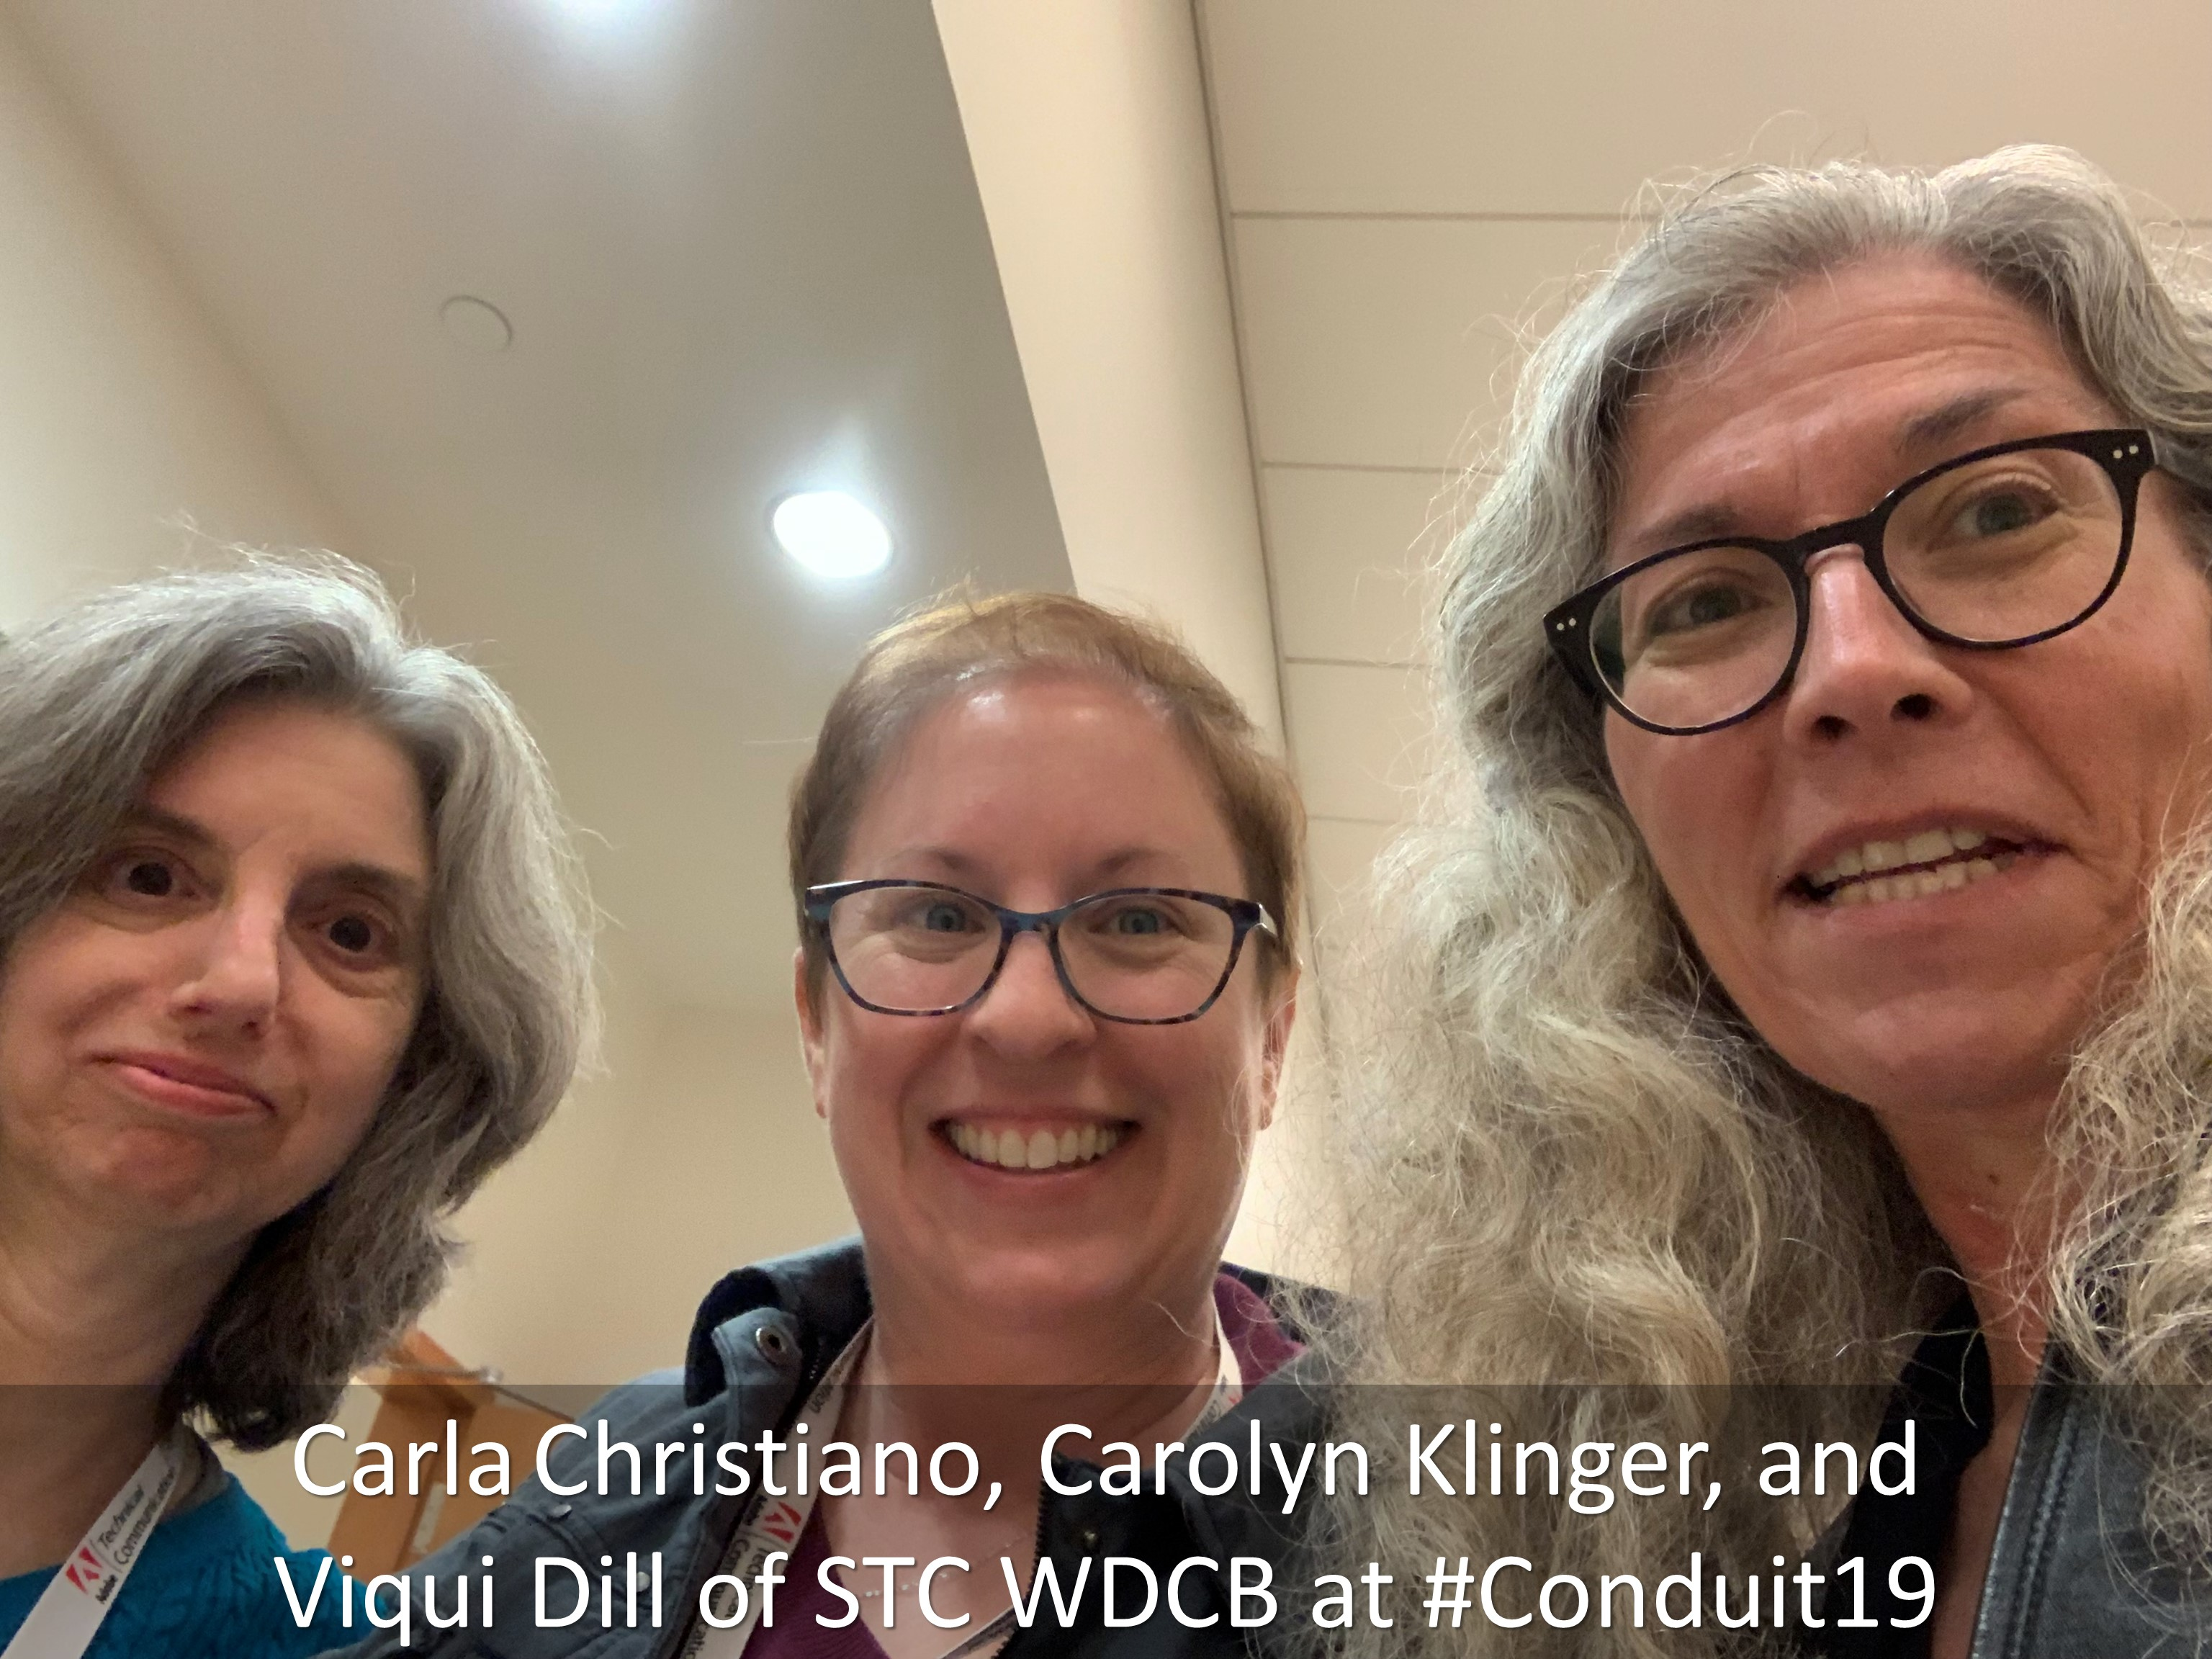 17 Carla Christiano Carolyn Klinger and Viqui Dill of STC WDCB at Conduit19